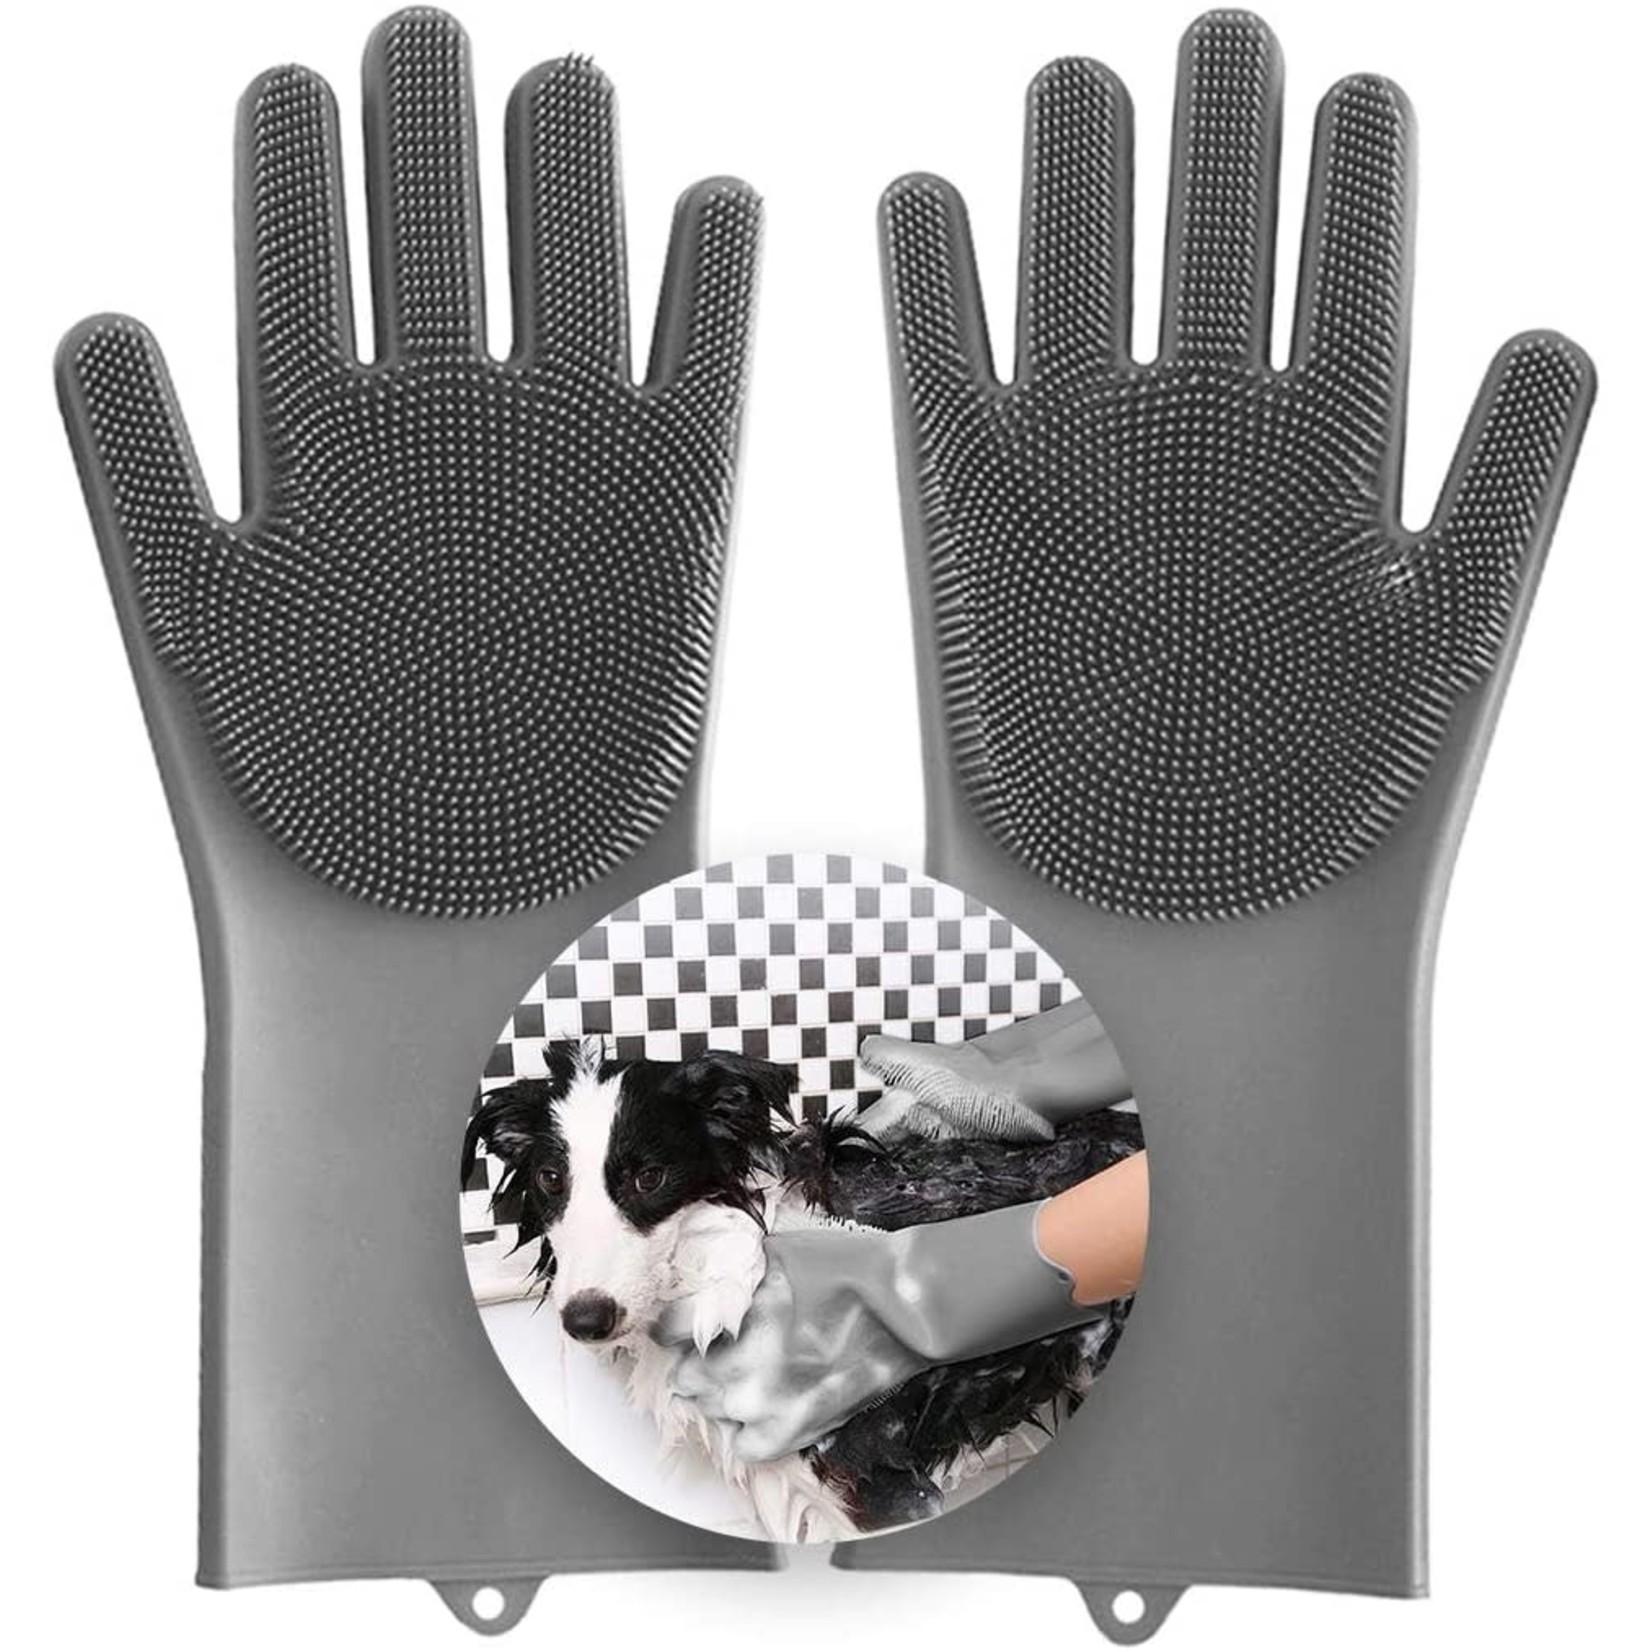 Magic Pet Grooming & bathing Gloves